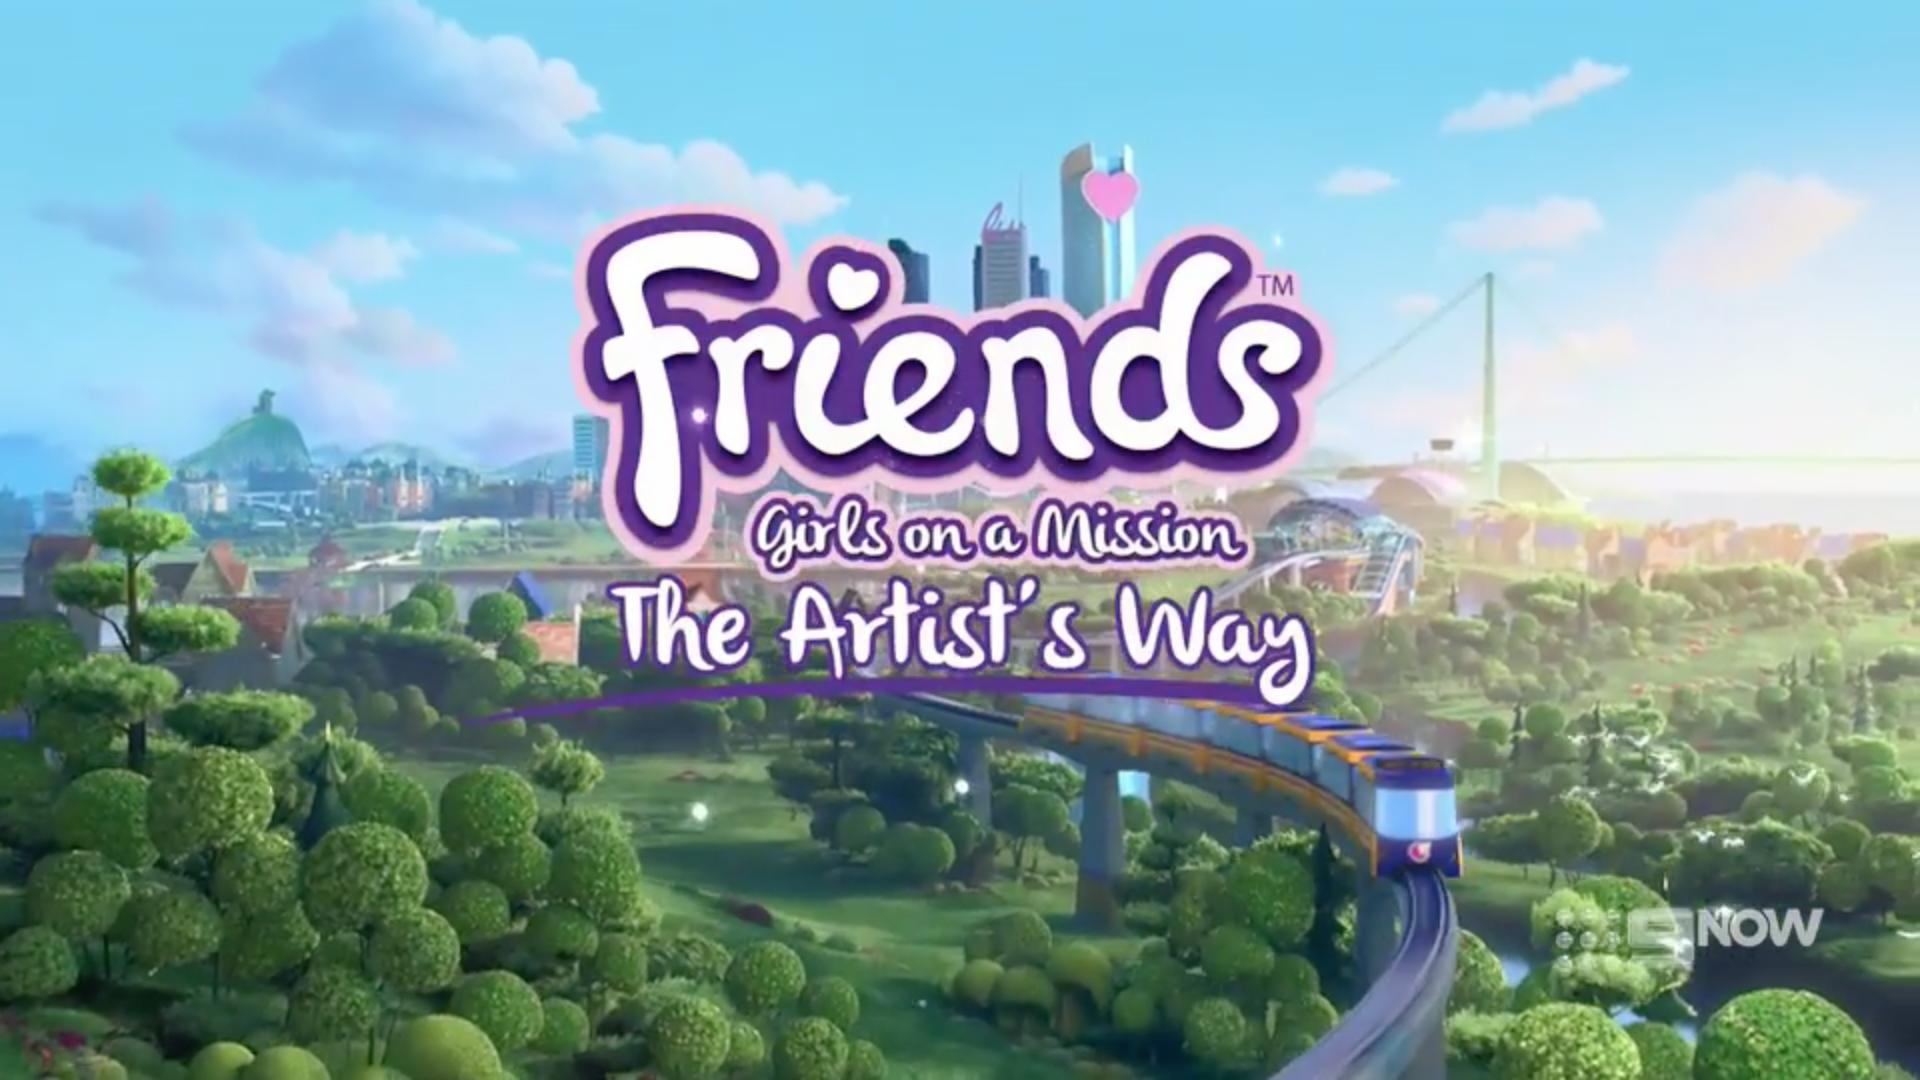 The artists way lego friends wiki fandom powered by wikia the artists way malvernweather Gallery